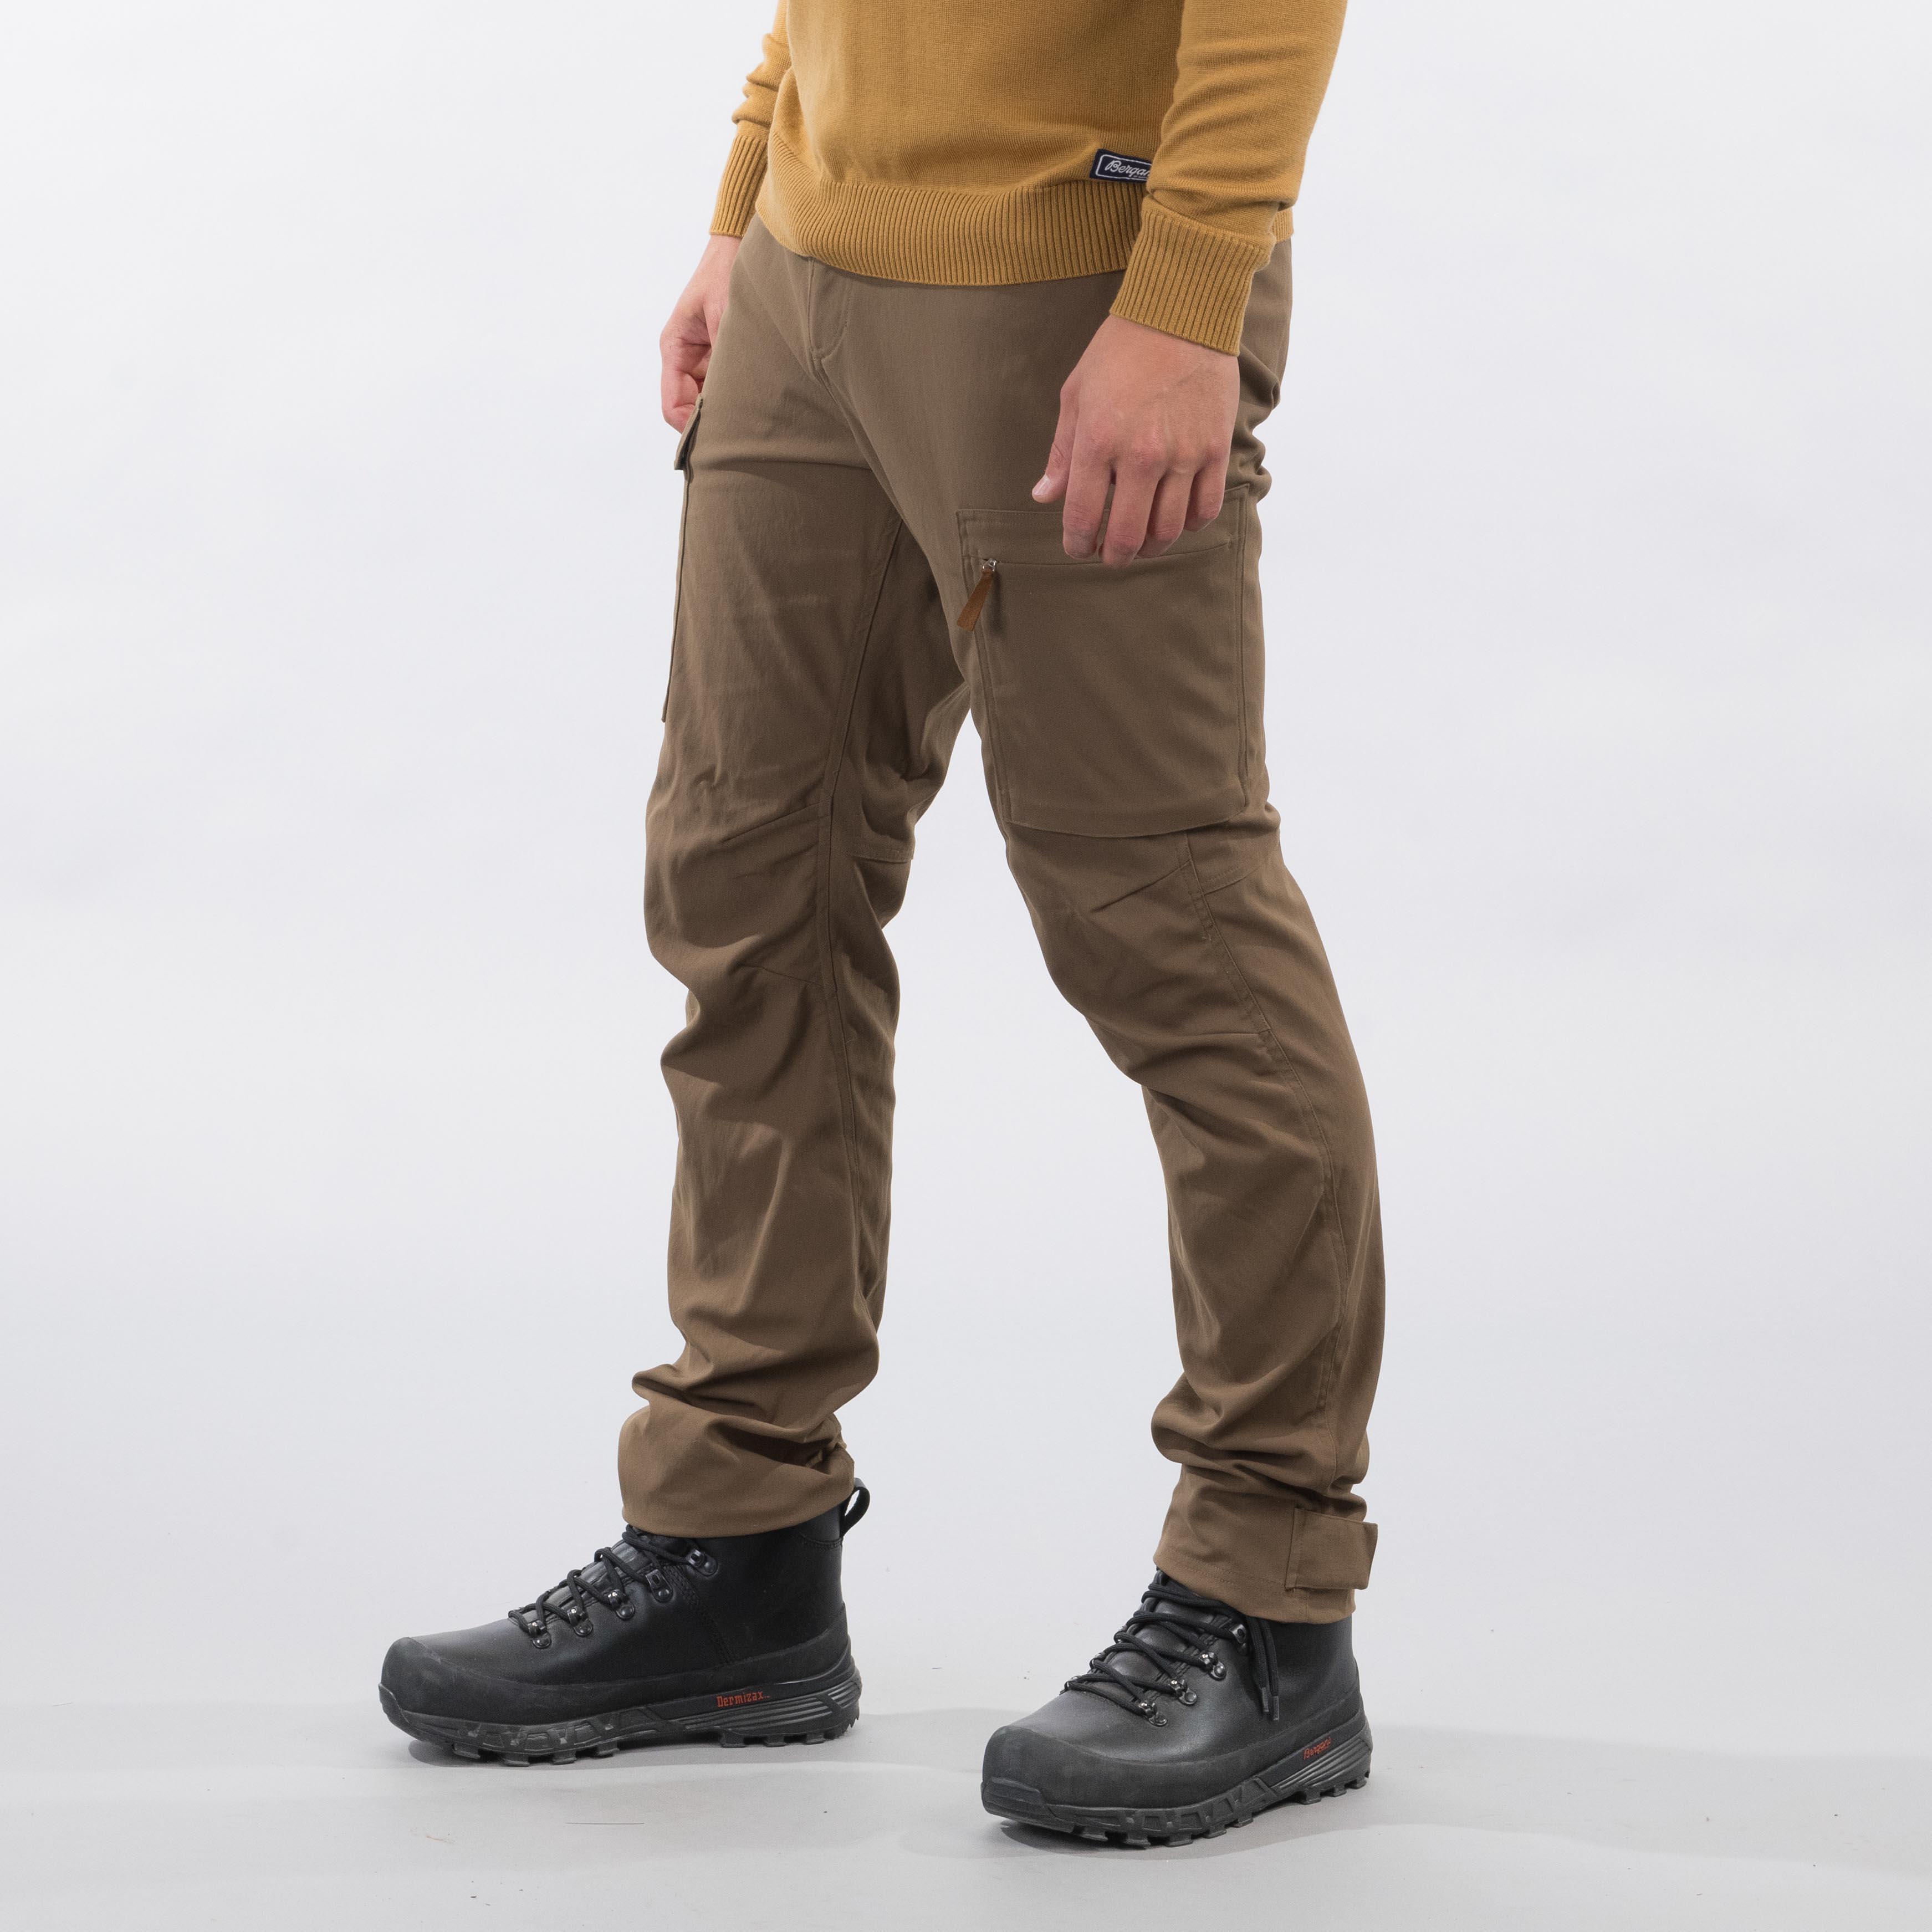 Nordmarka Pants